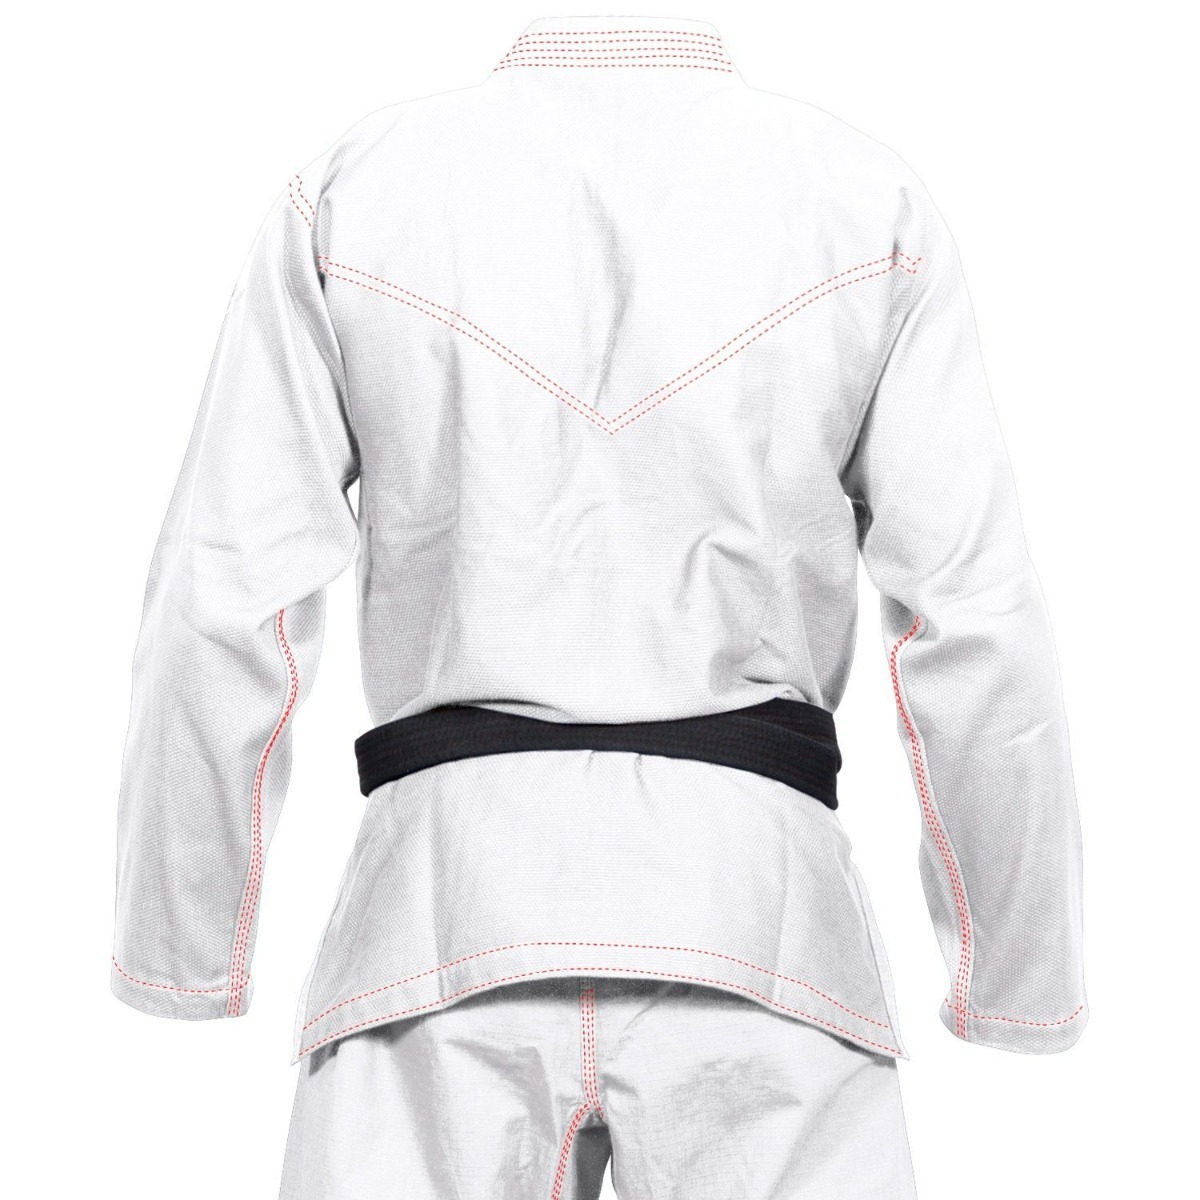 Kimono Gi Venum Elite Jiu Jitsu Judo - $ 5.670,00 en Mercado Libre